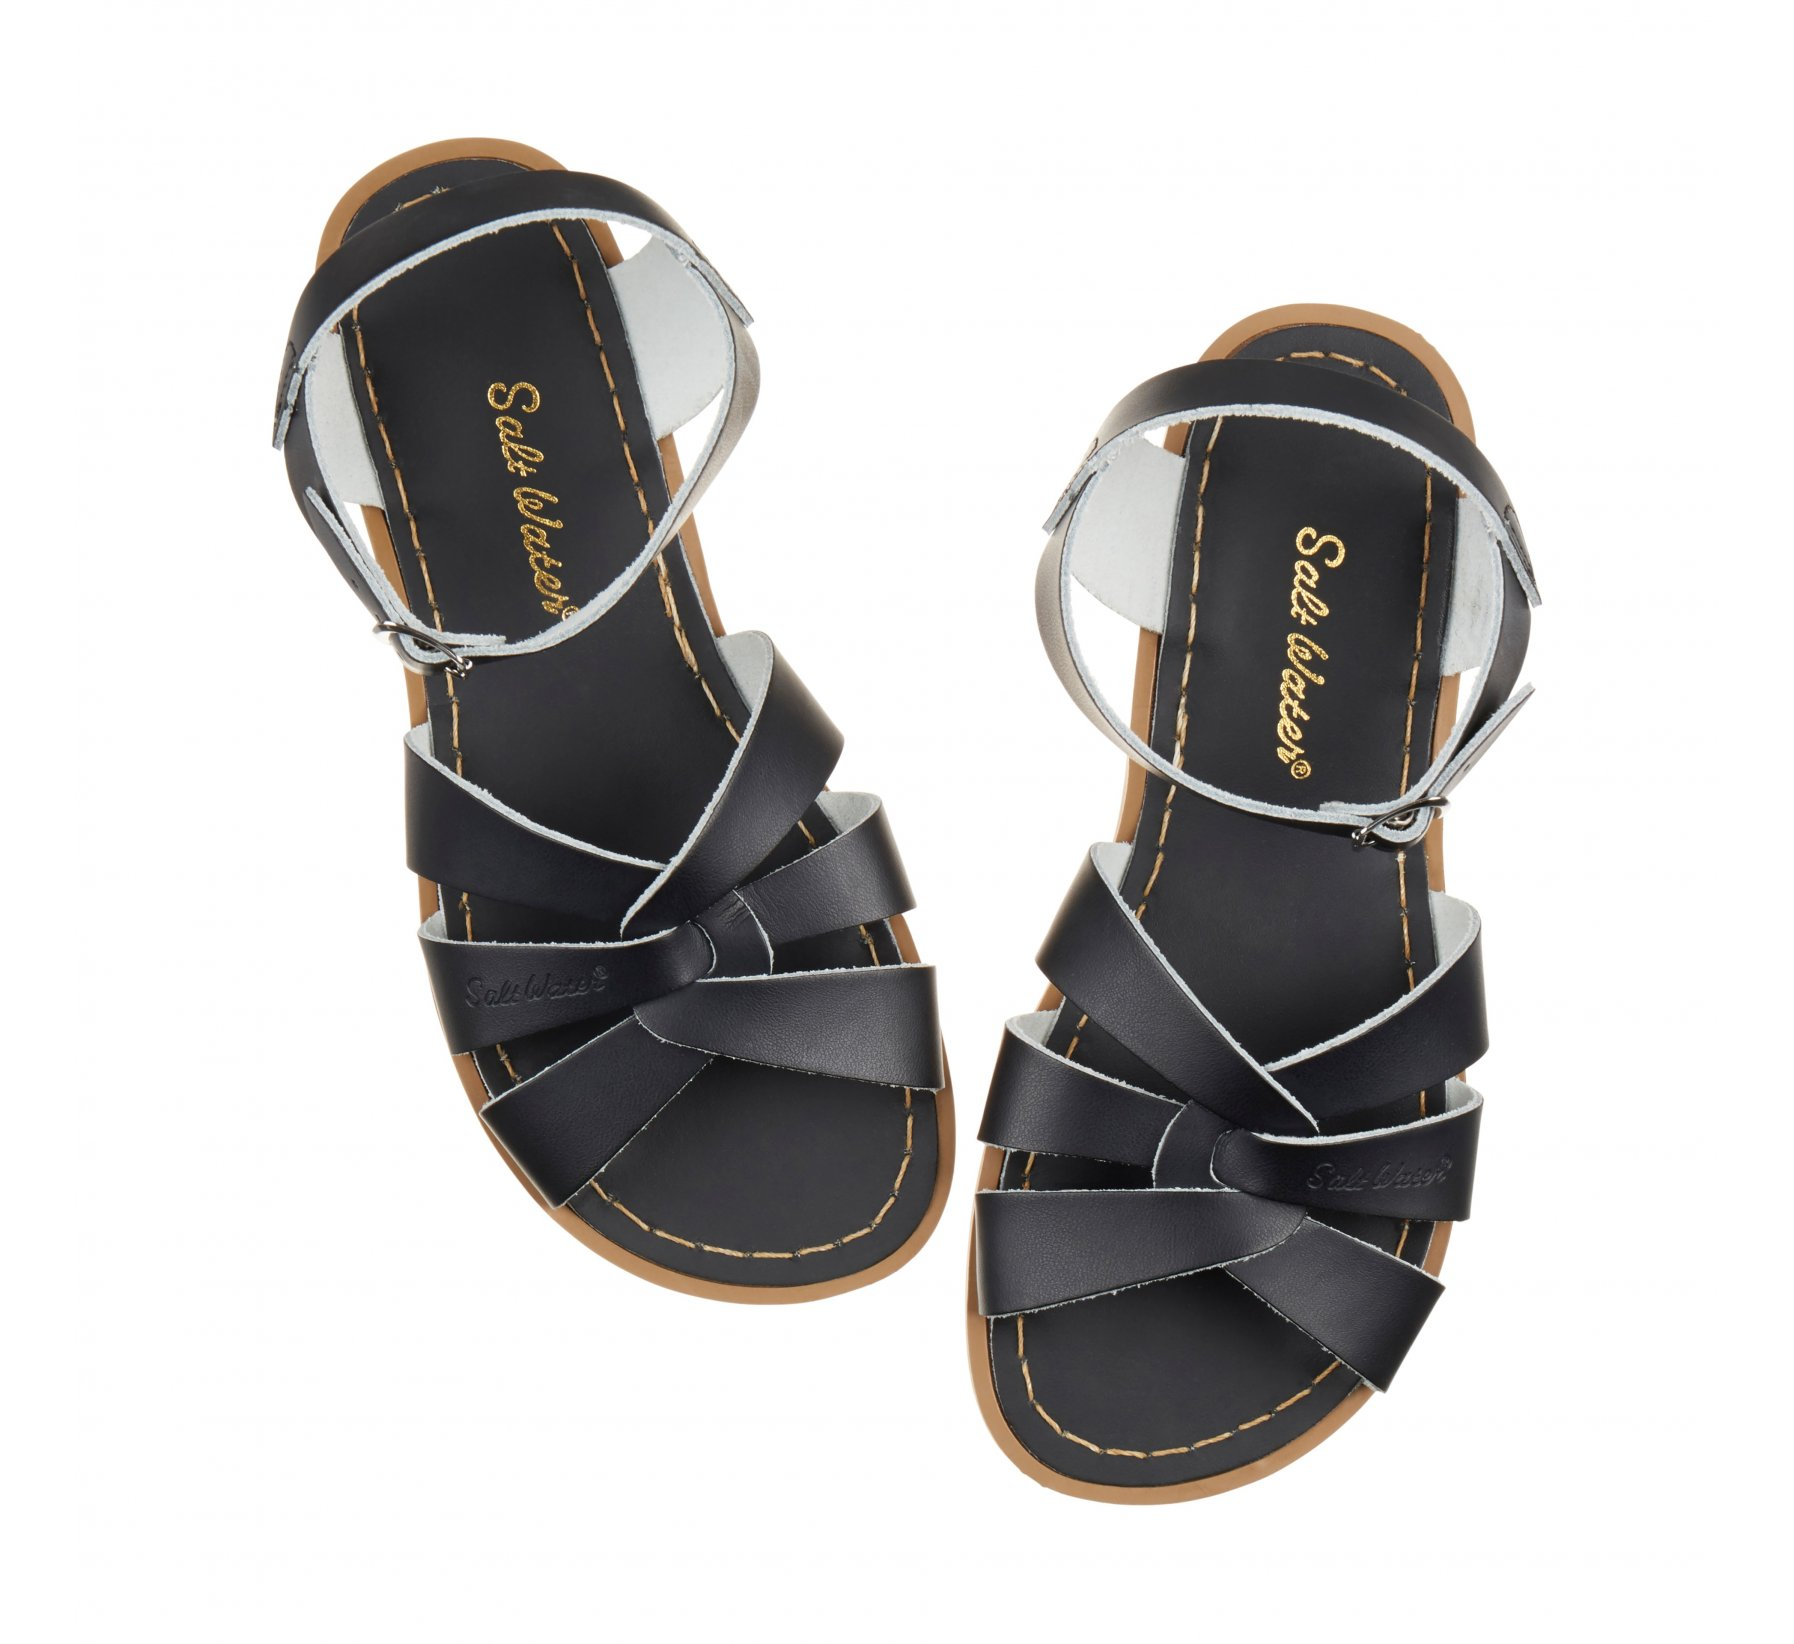 Original in Schwarz - Salt Water Sandals